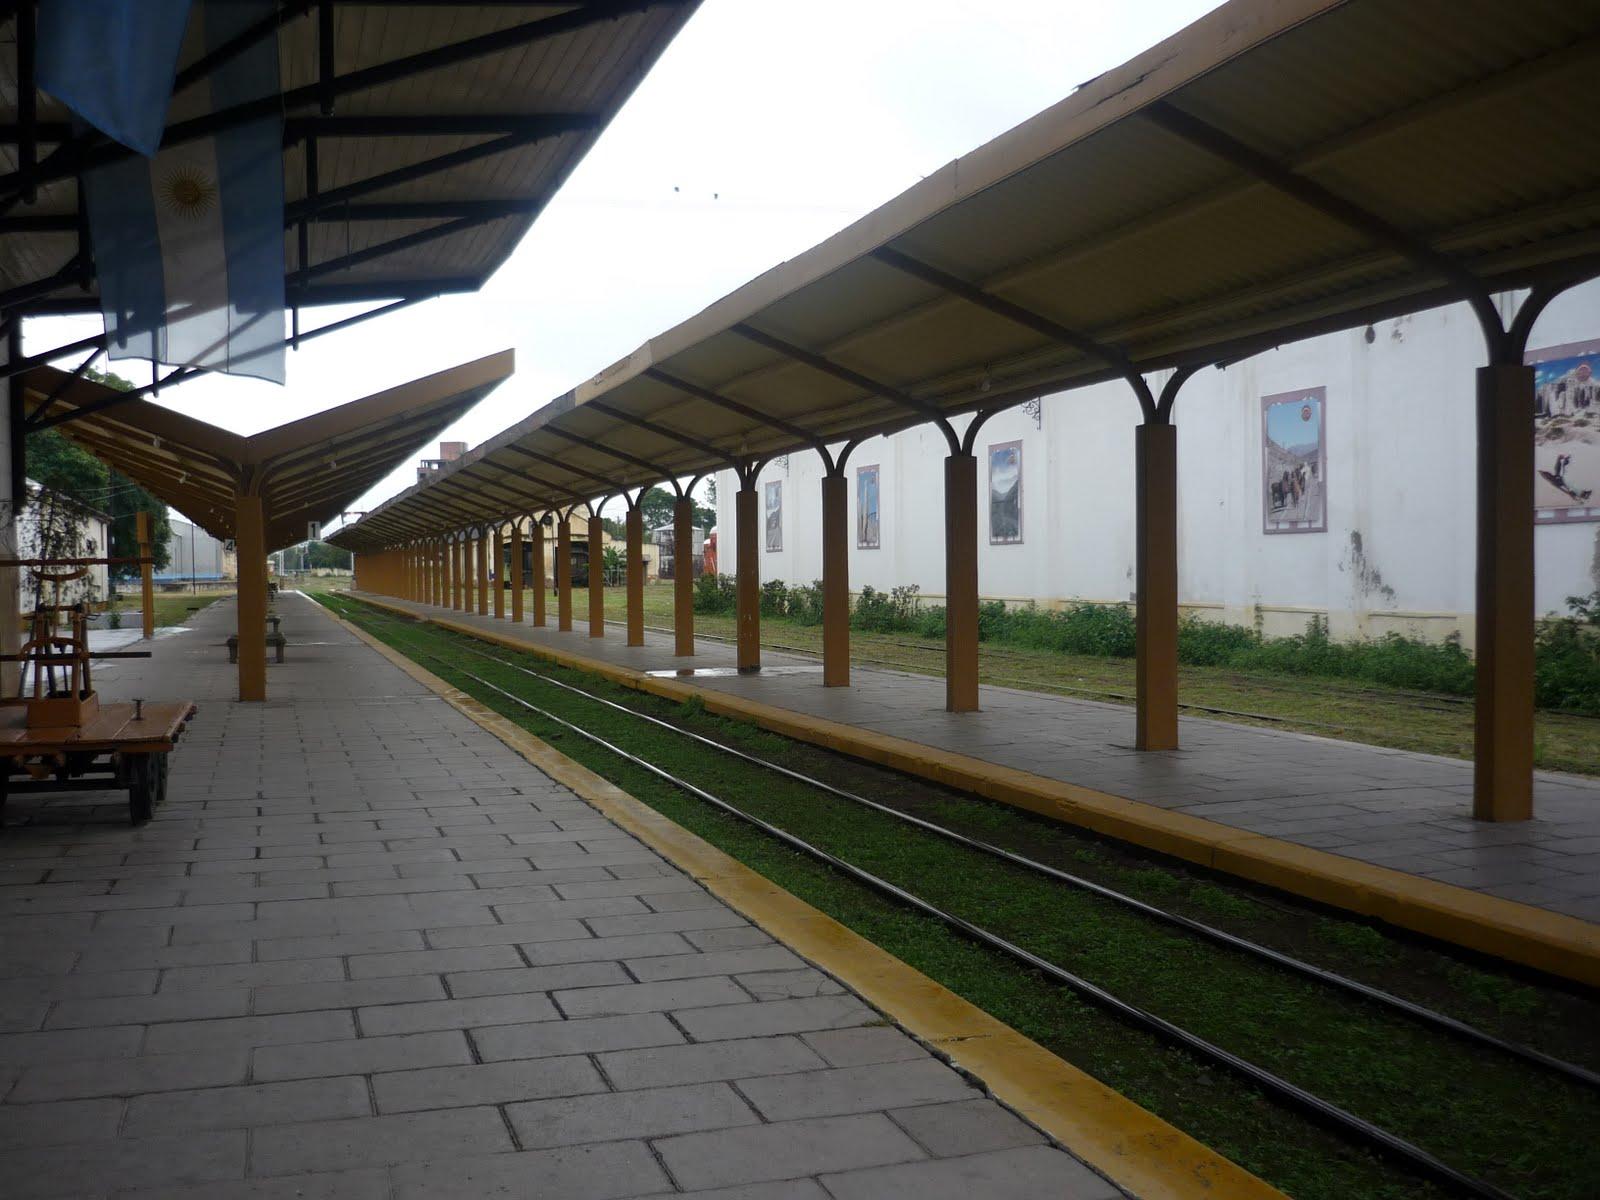 cronicas e historias ferroviarias: SALTA II